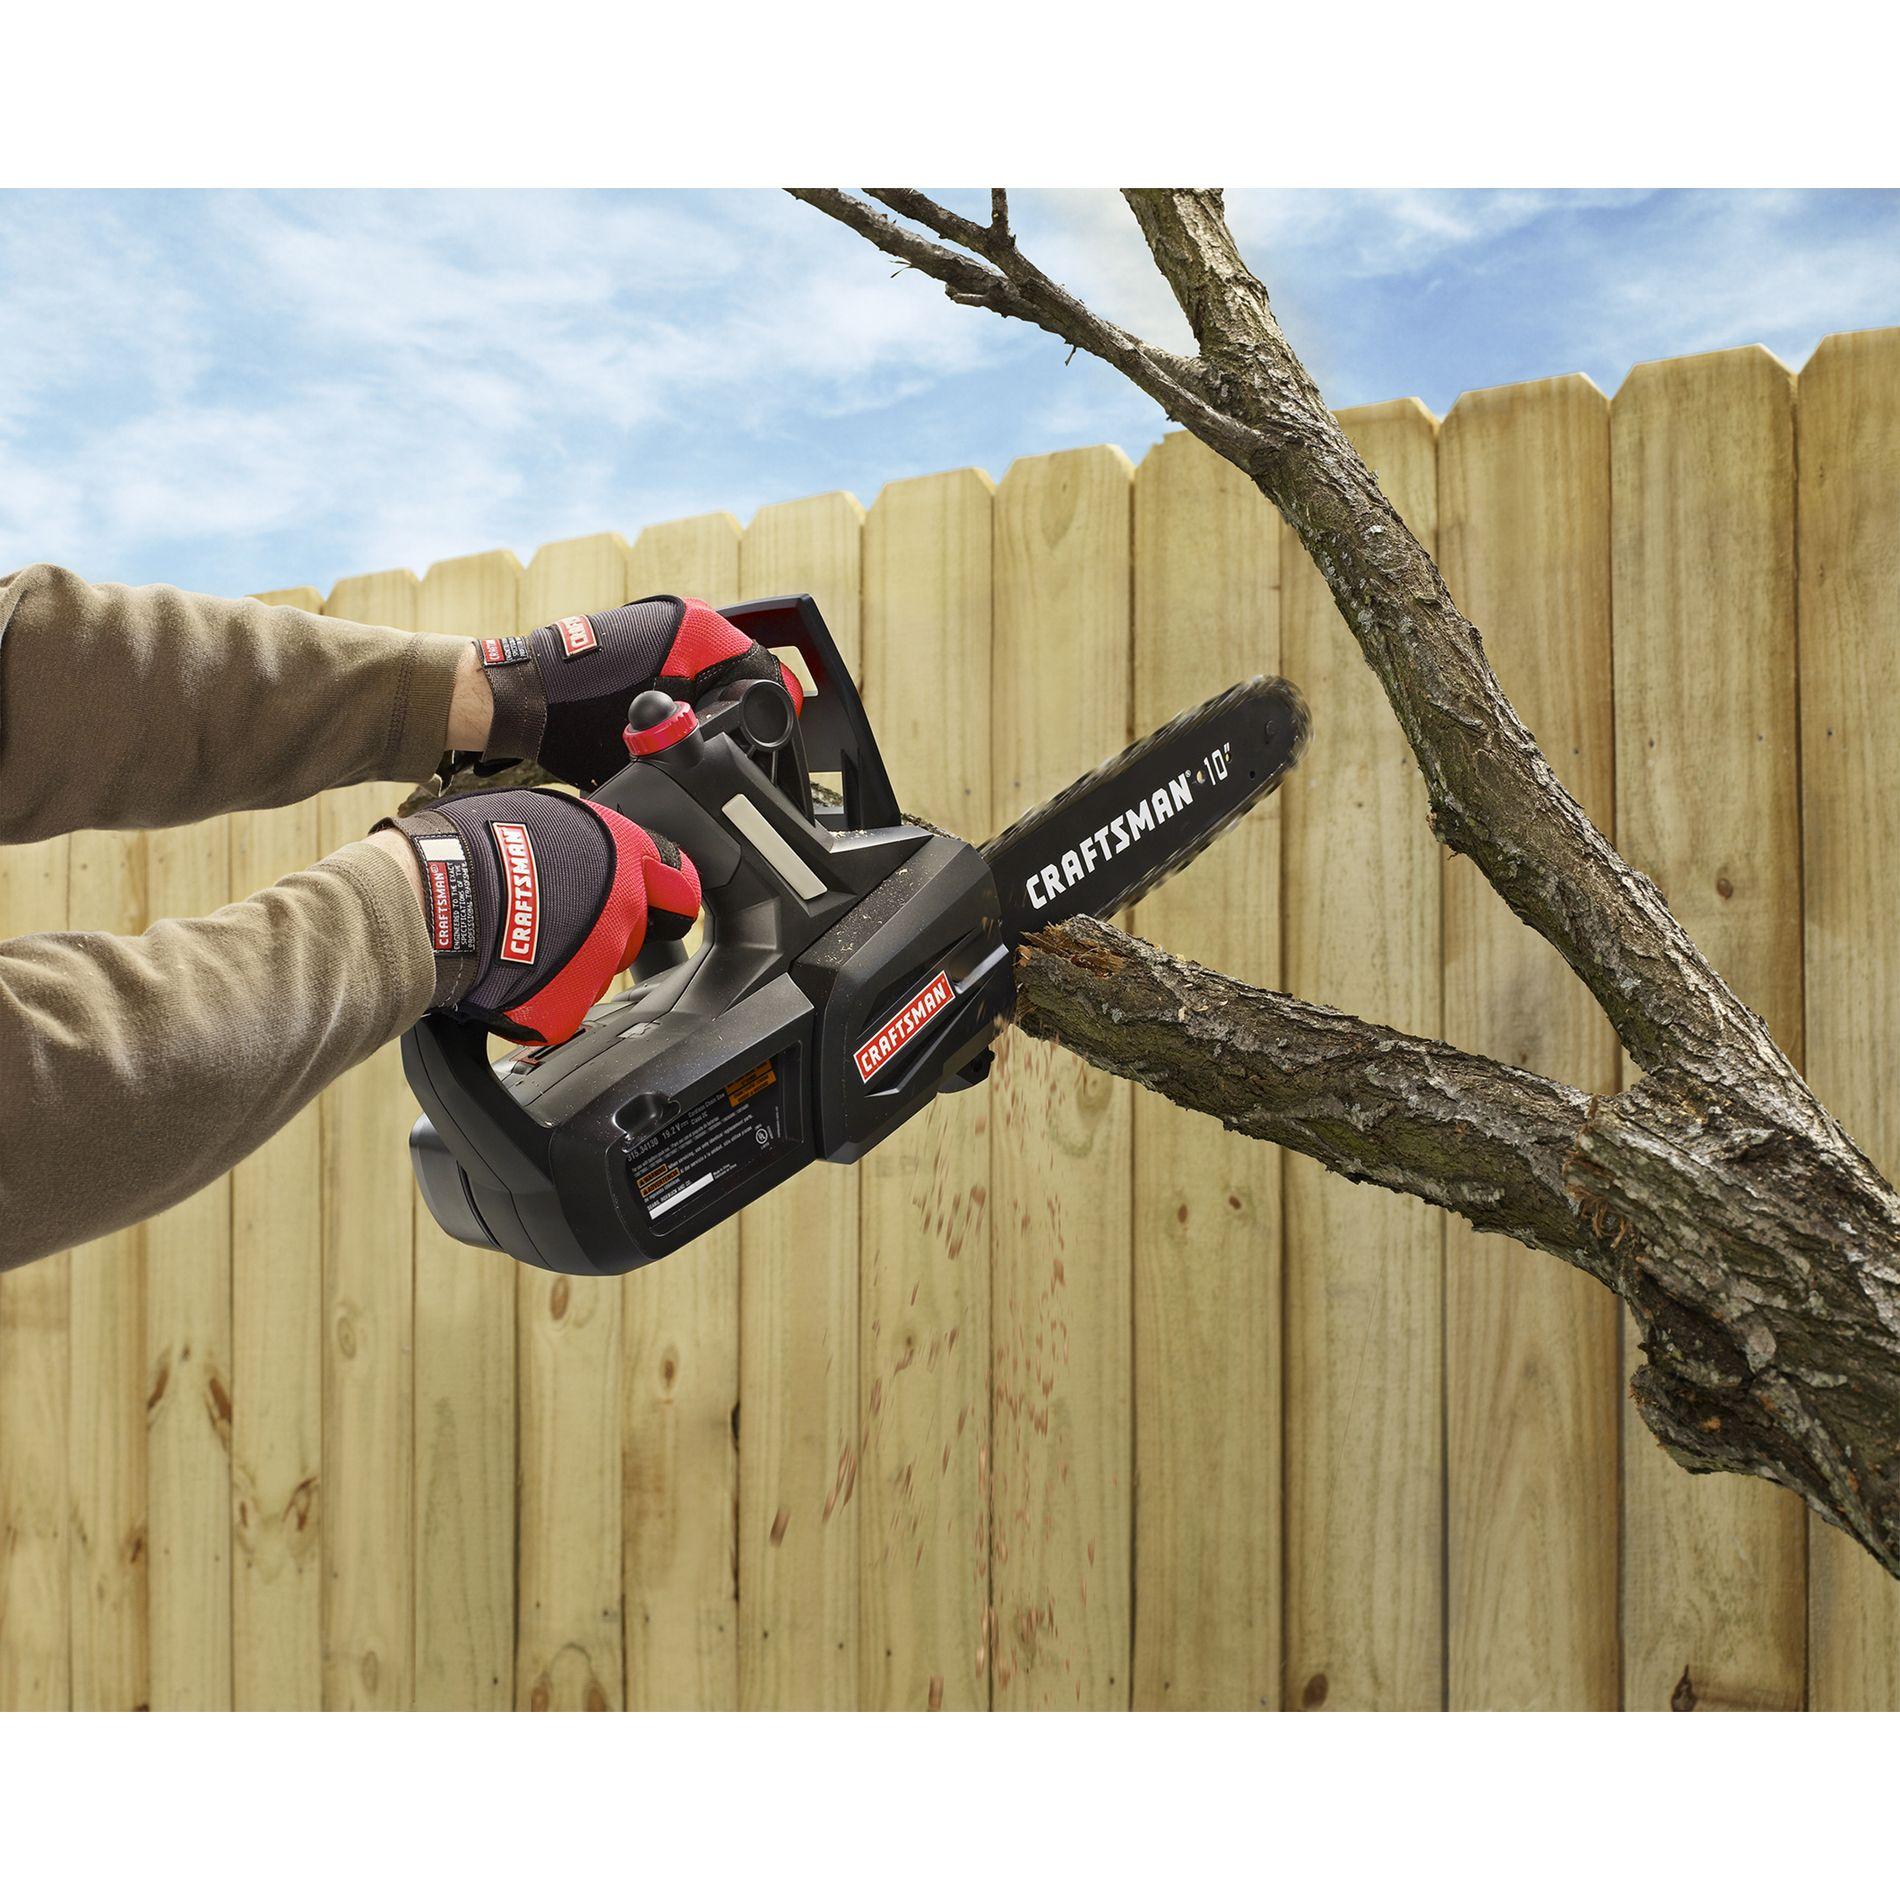 "Craftsman 19.2 Volt 10"" Cordless Chain Saw"